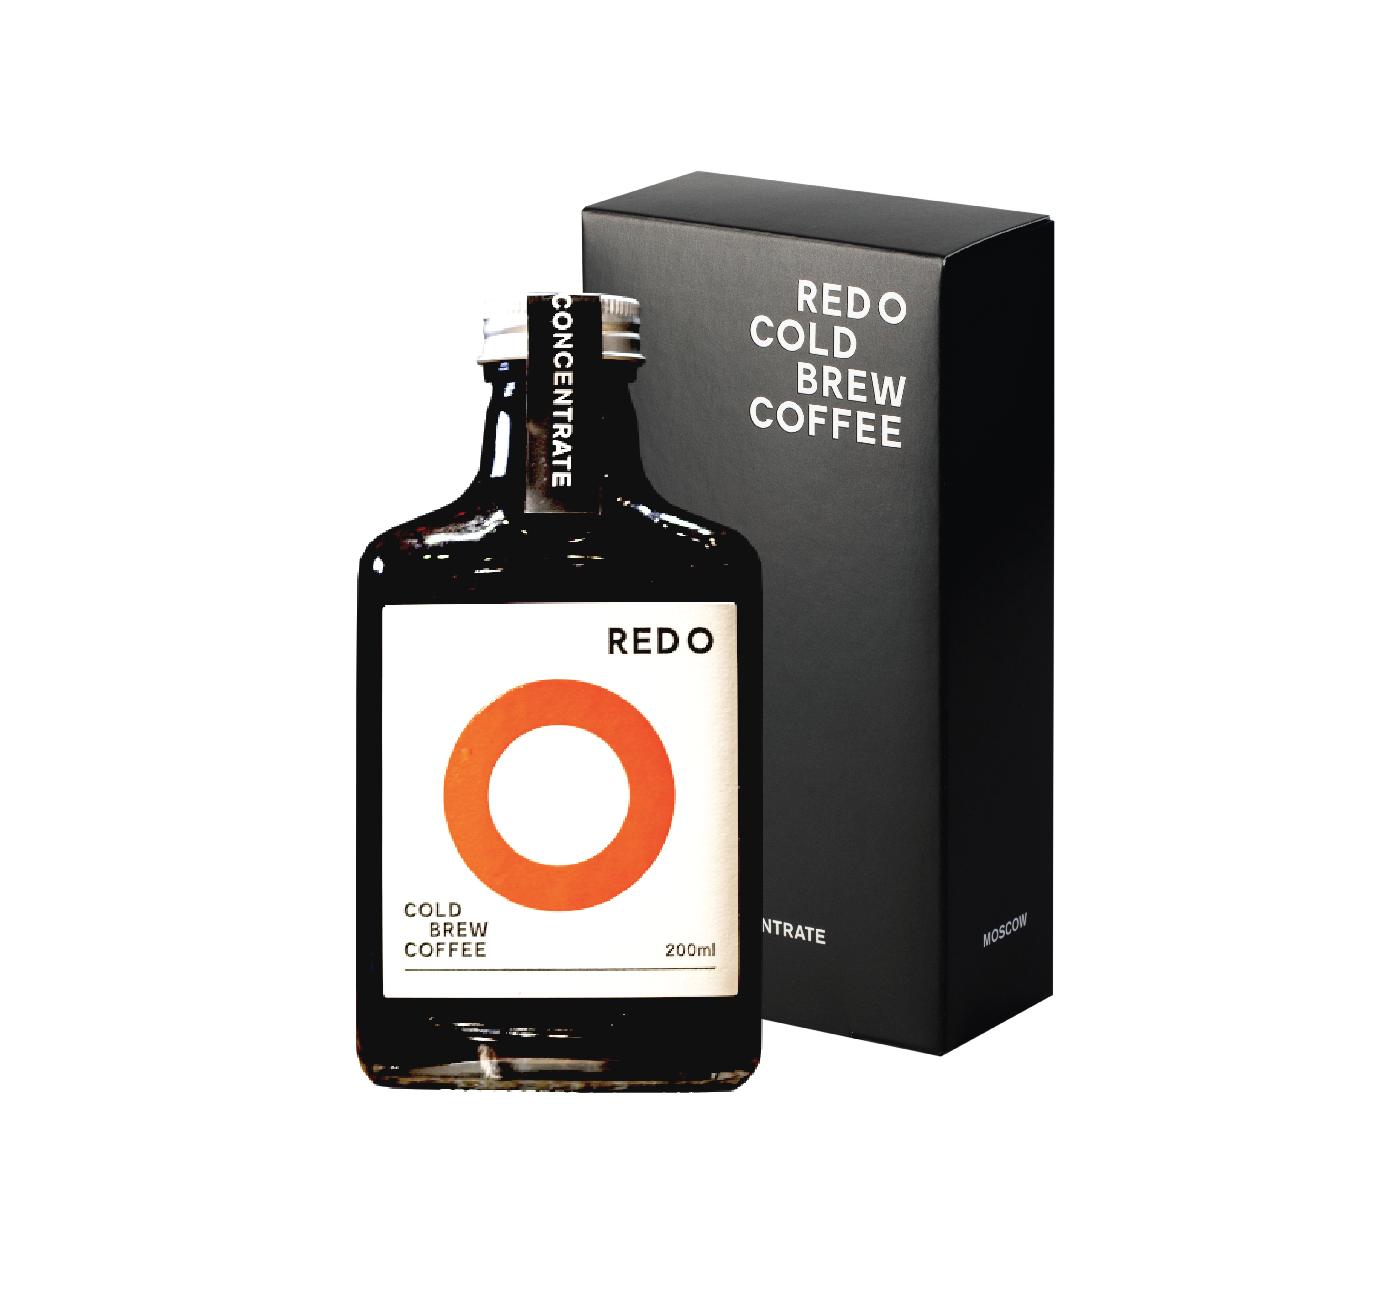 REDO Концентрат Колд брю кофе, П/У, 200 мл